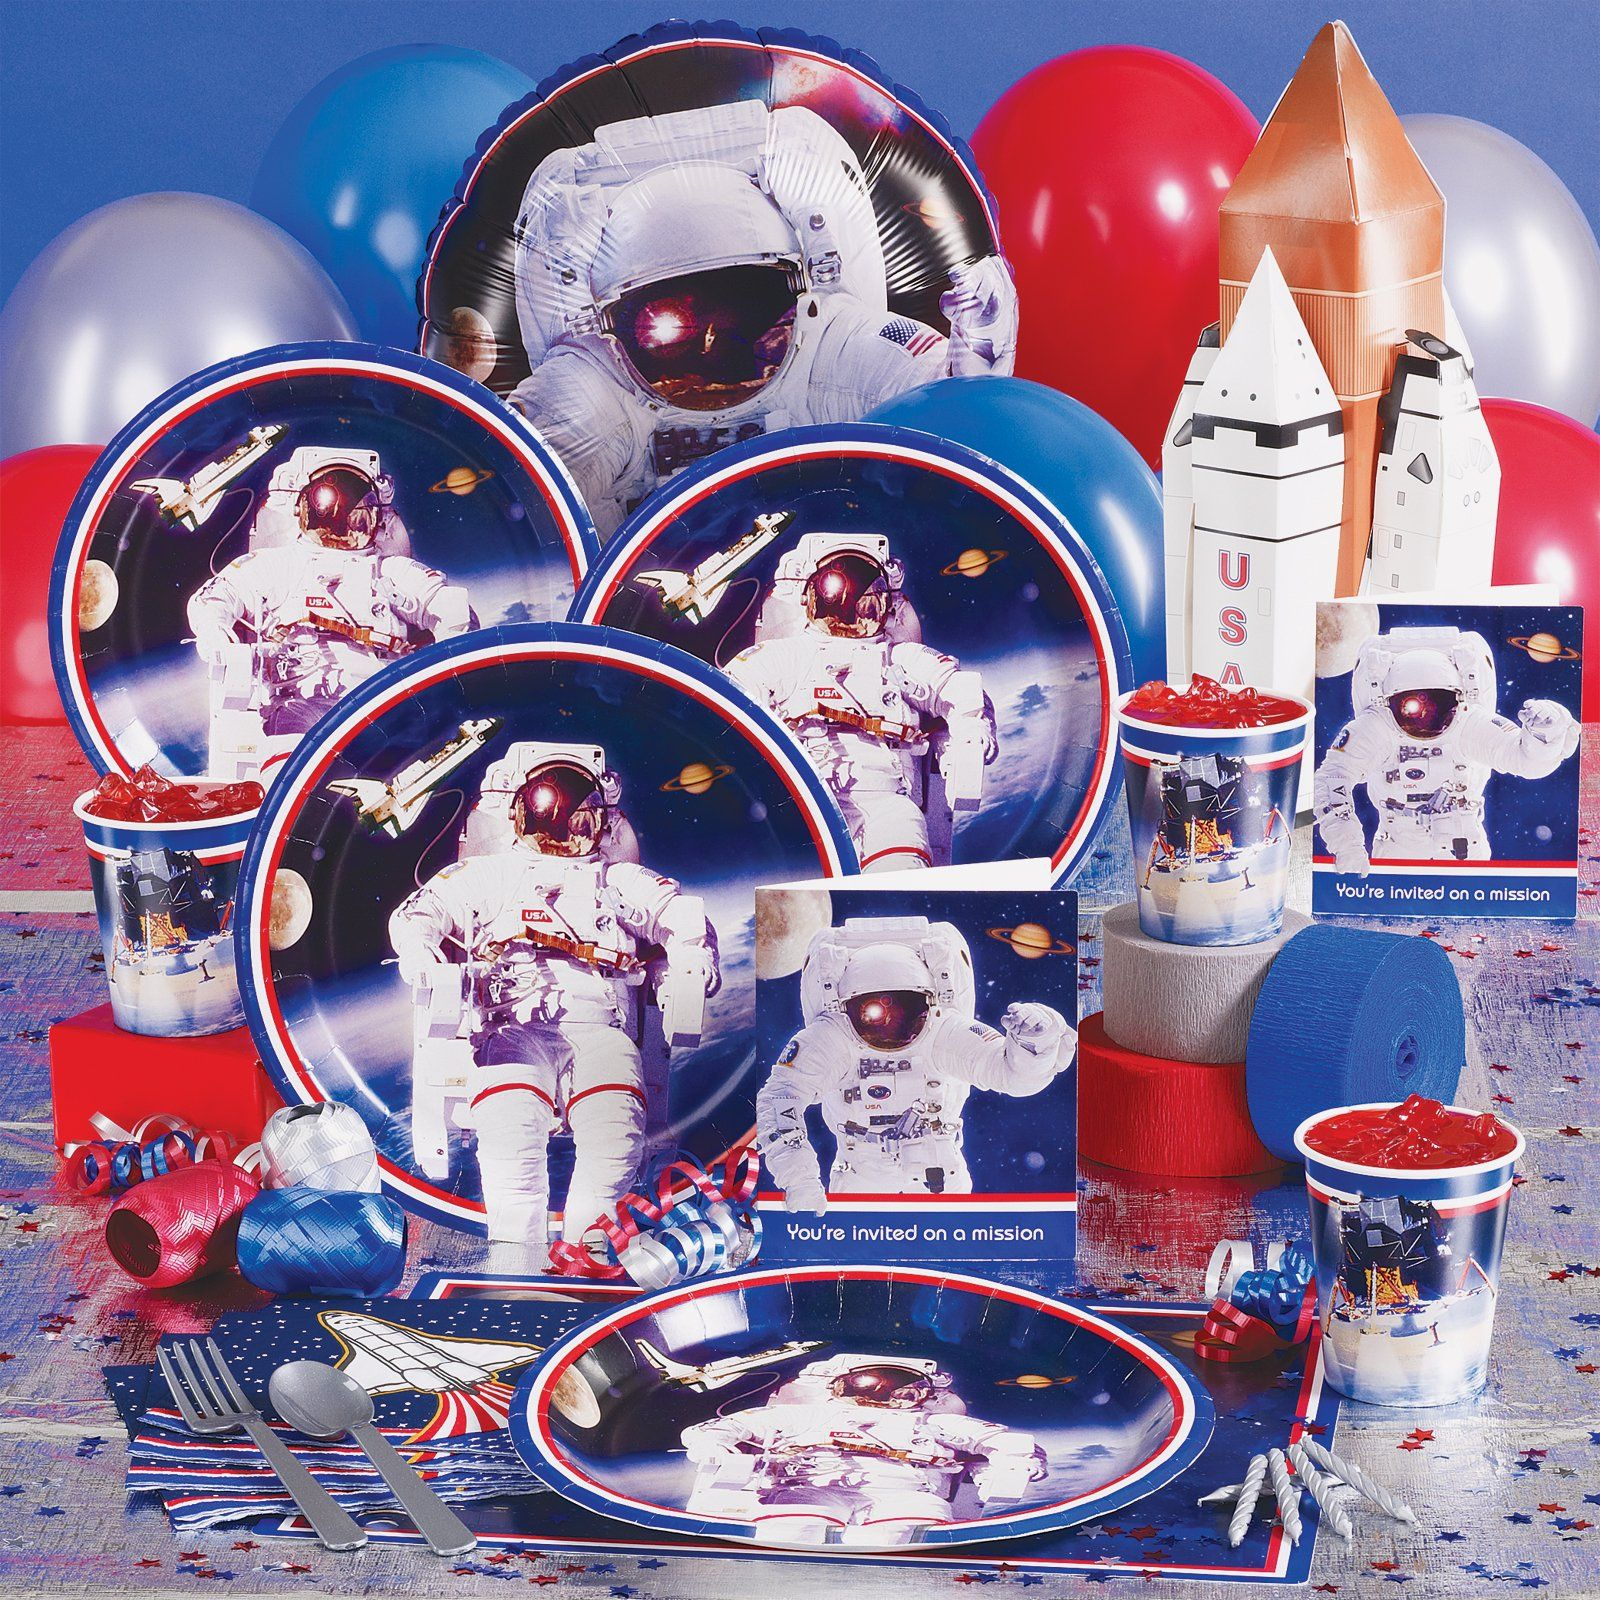 Astronaut theme should we do training idea. NASA